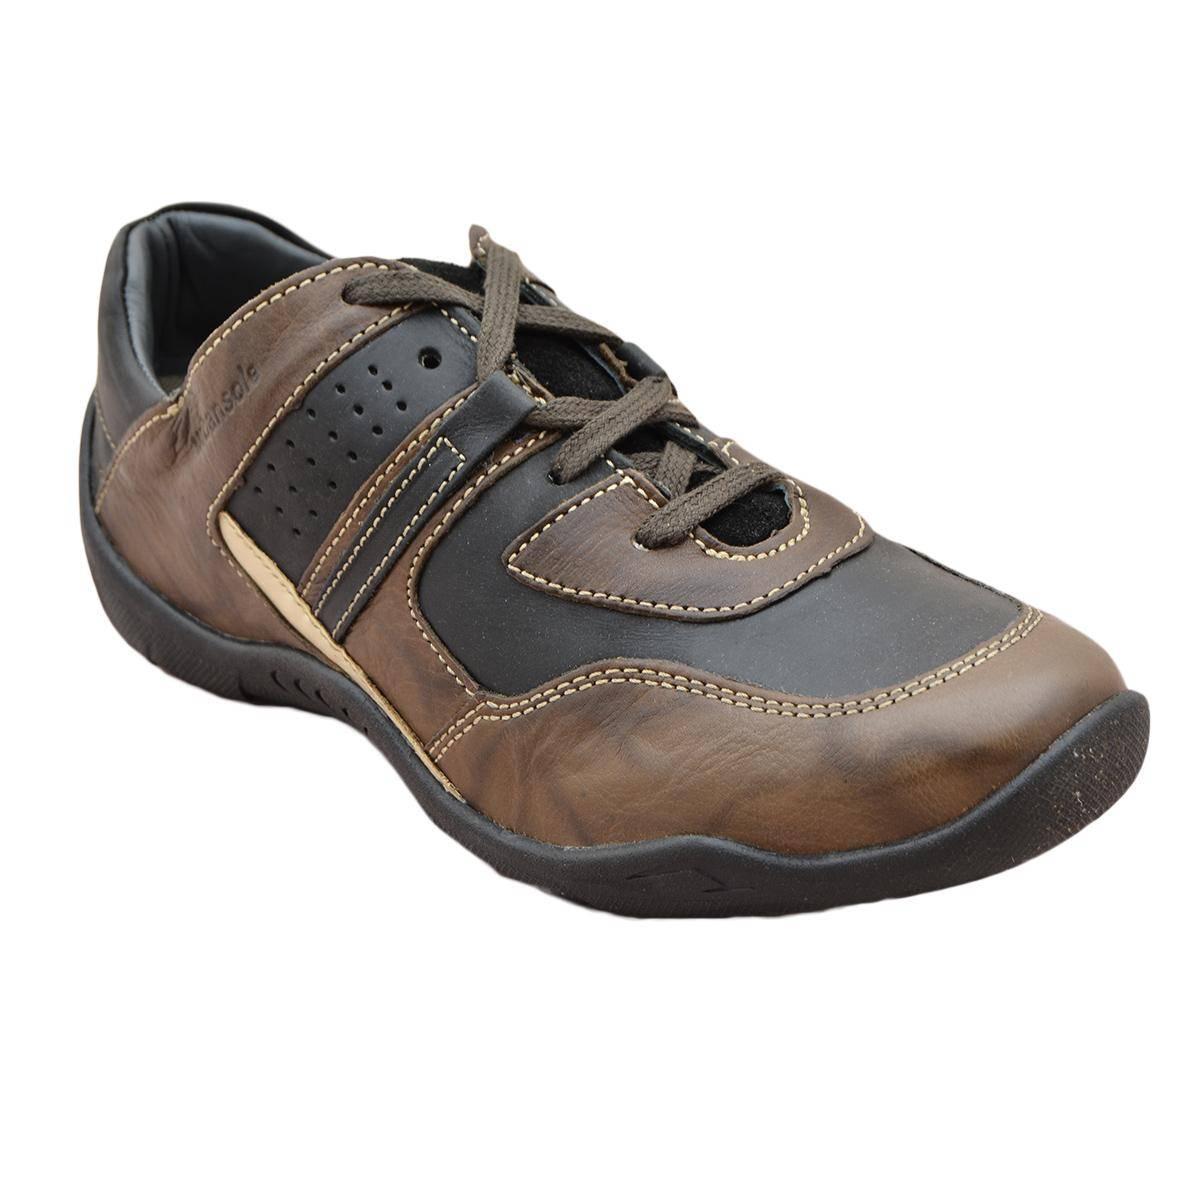 Urban Sole Sneaker Winter Collection 8033-Black